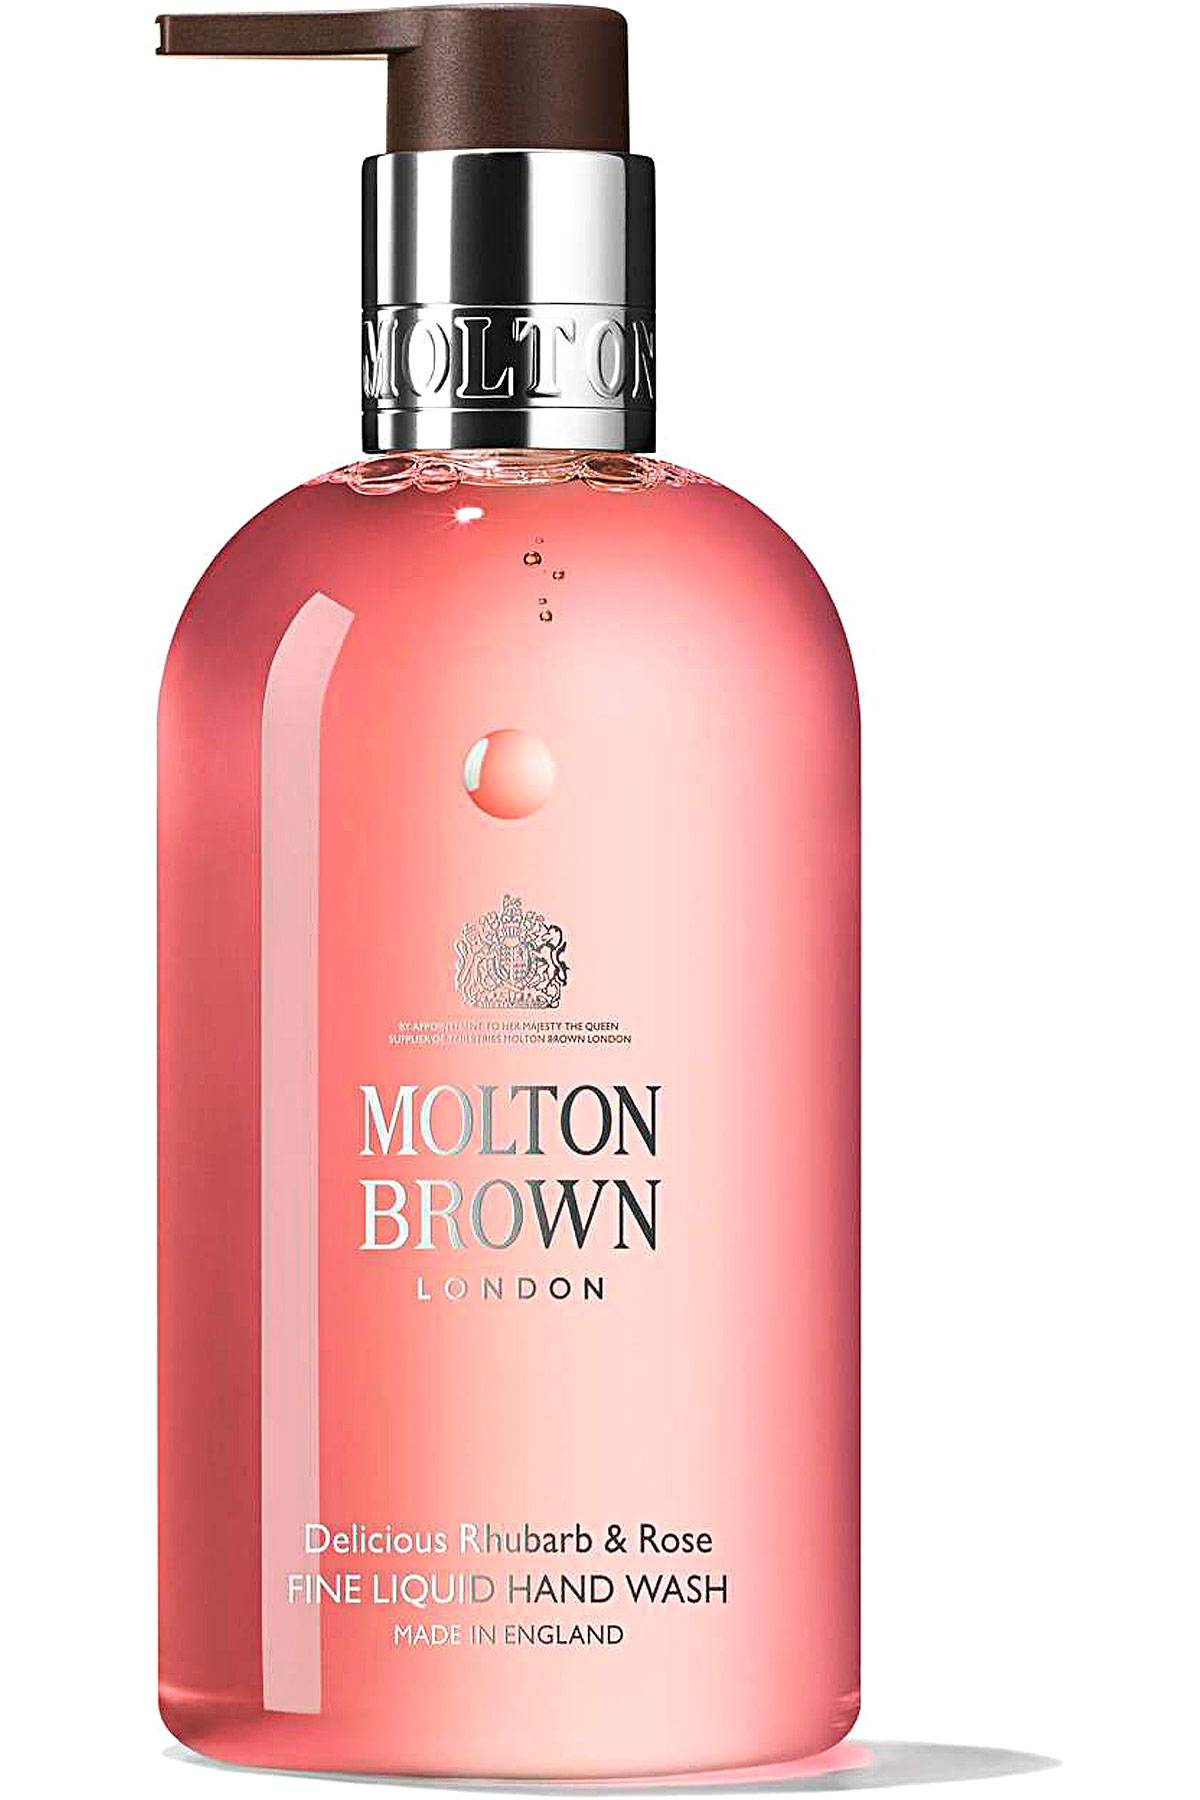 Molton Brown Beauty for Women, Delicious Rhubarb & Rose - Liquid Hand Wash - 300 Ml, 2019, 300 ml